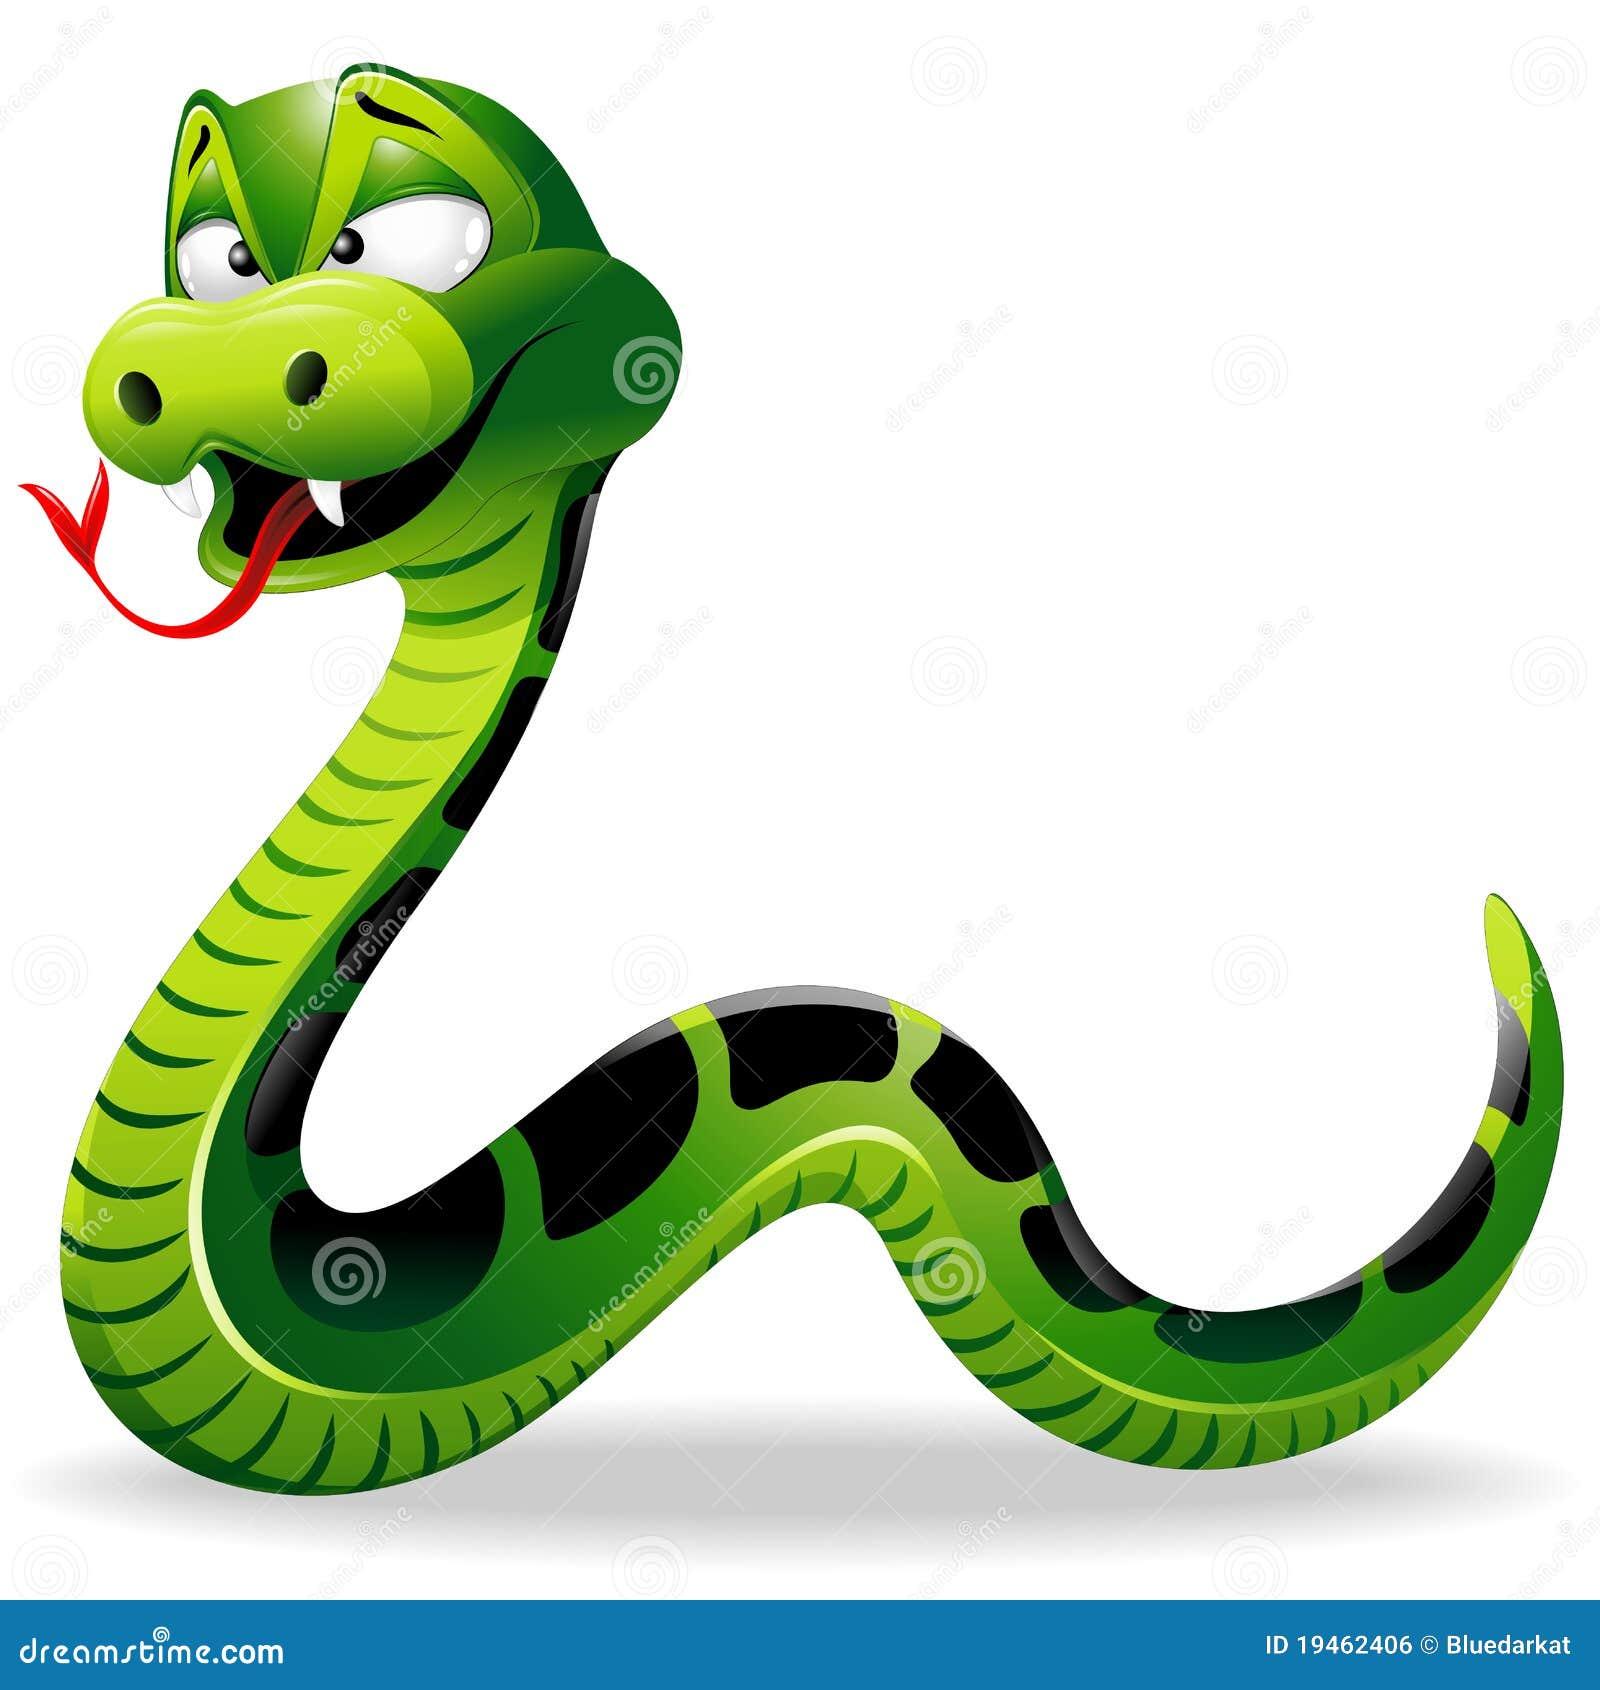 Green snake cartoon royalty free stock image image 19462406 - Green Snake Cartoon Royalty Free Stock Image